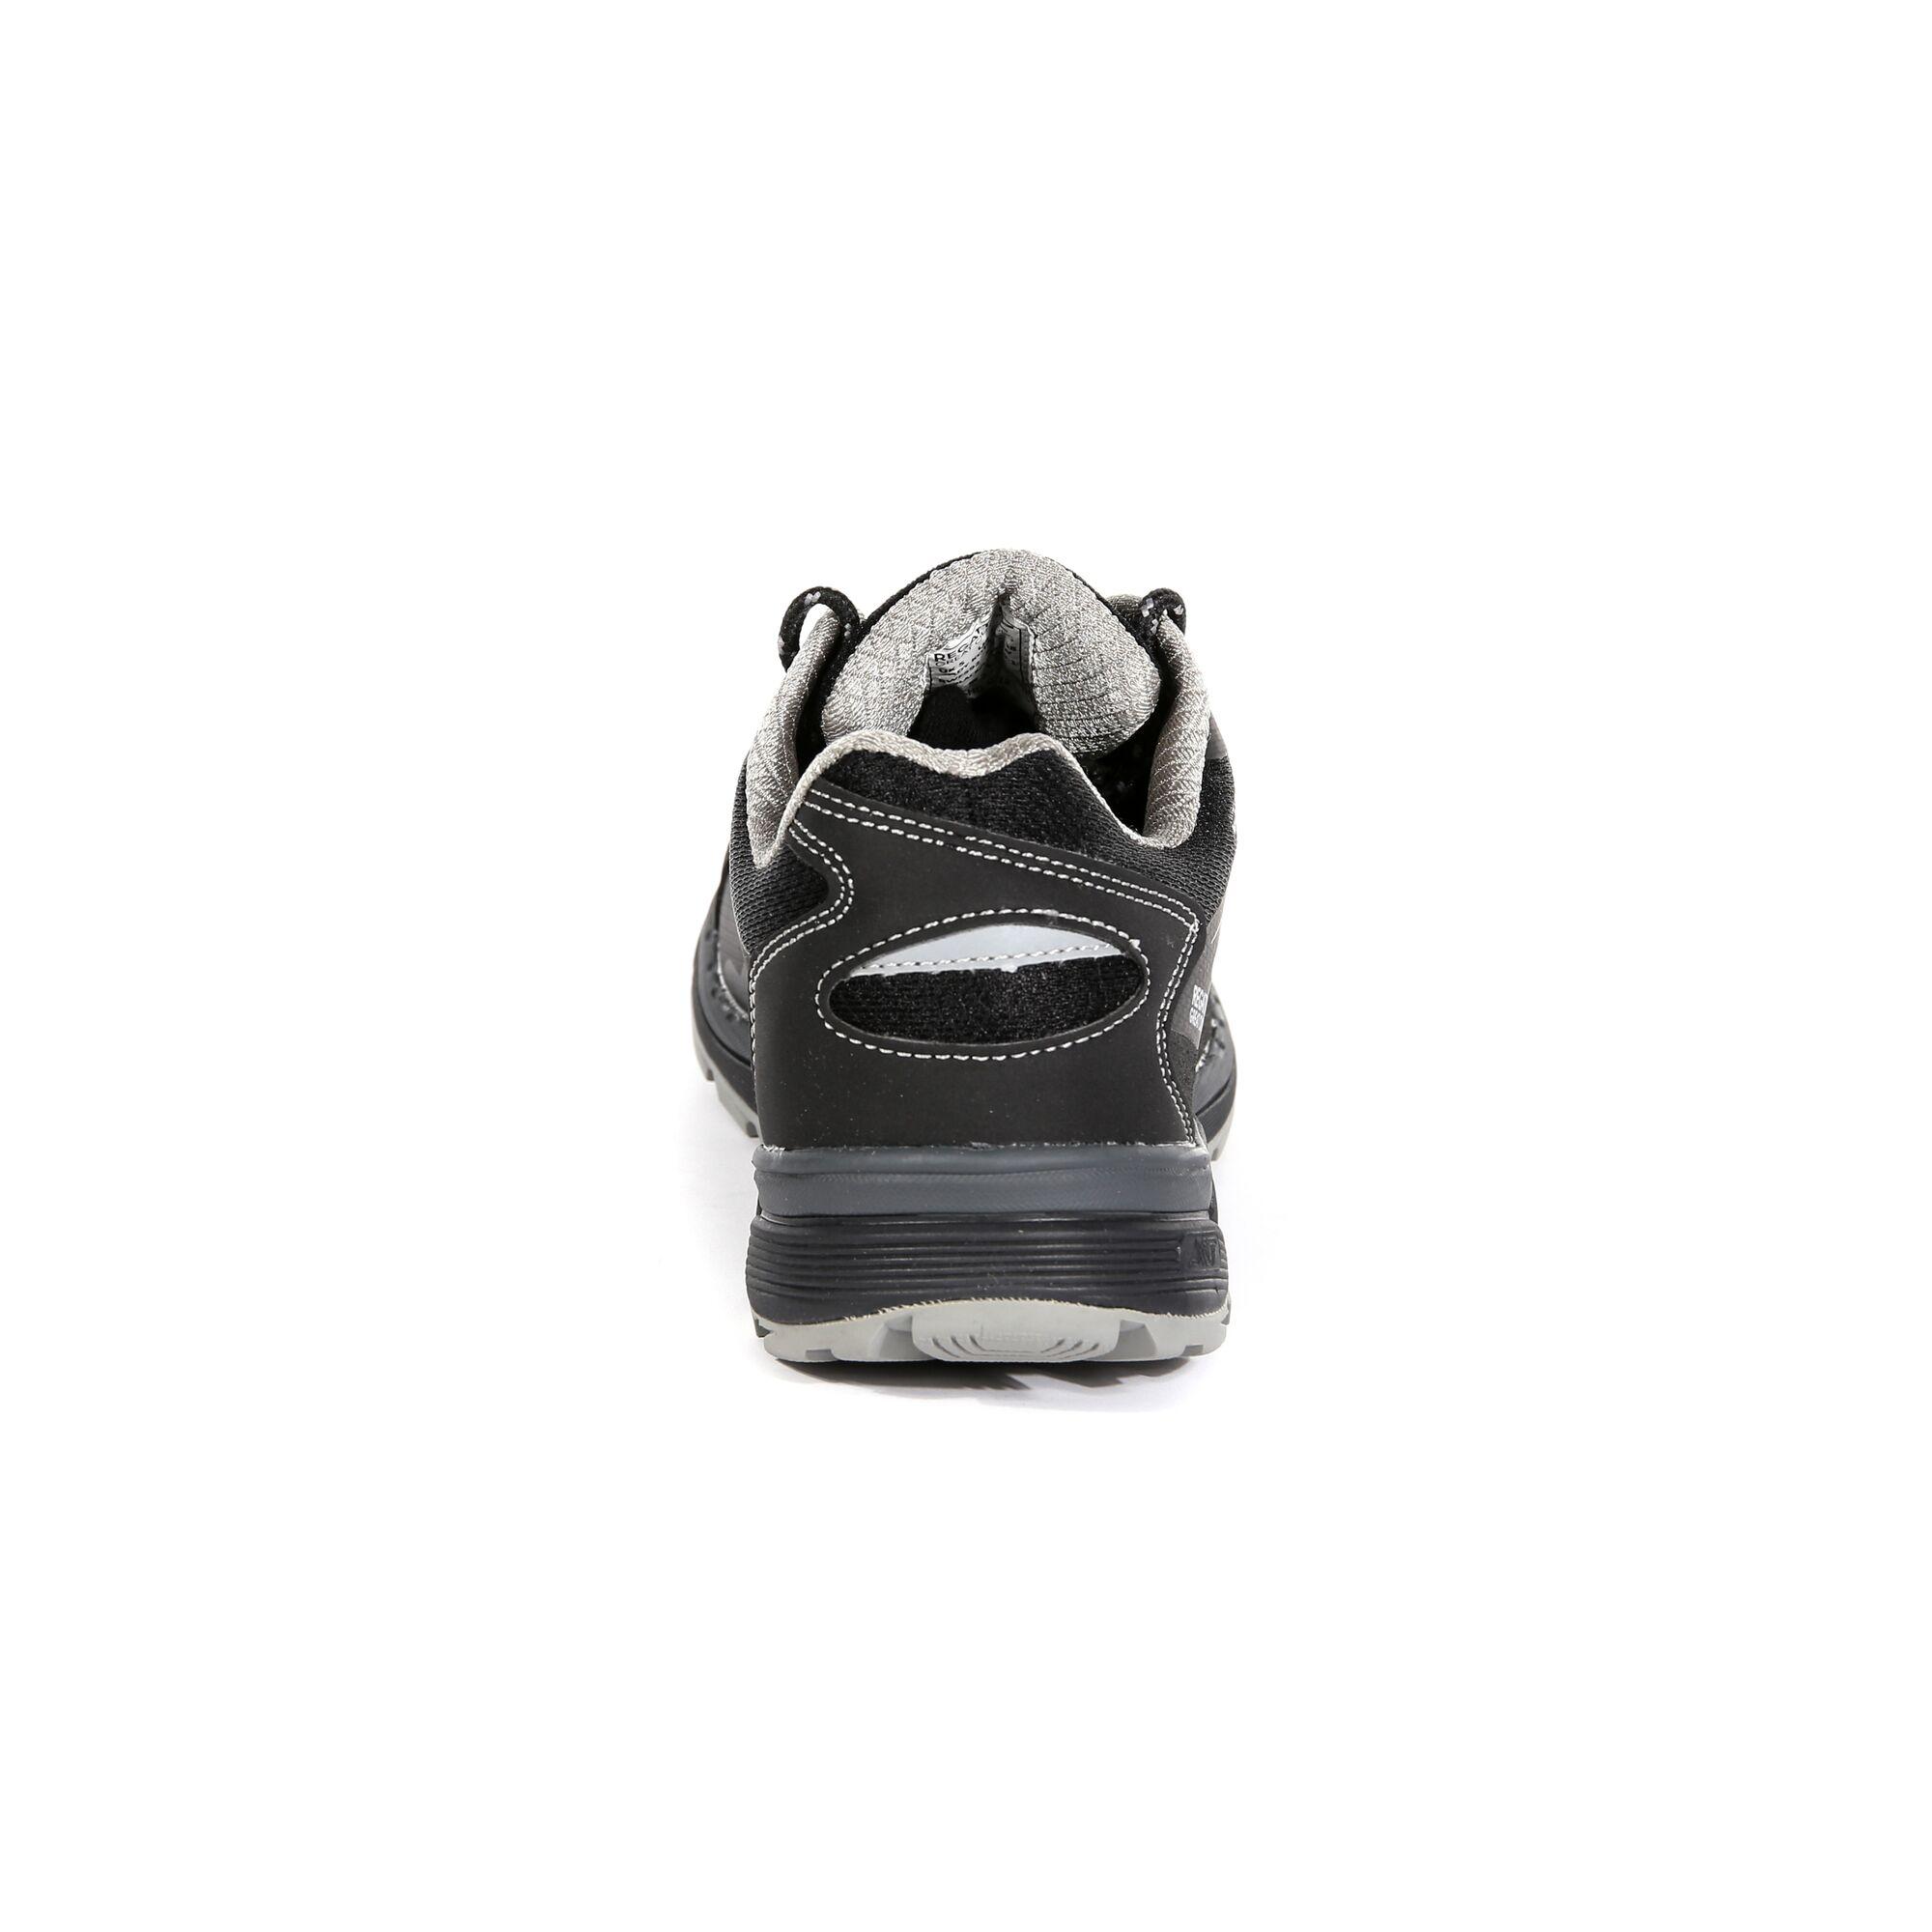 Regatta Women/'s Kota XLT Low Walking Shoes Black